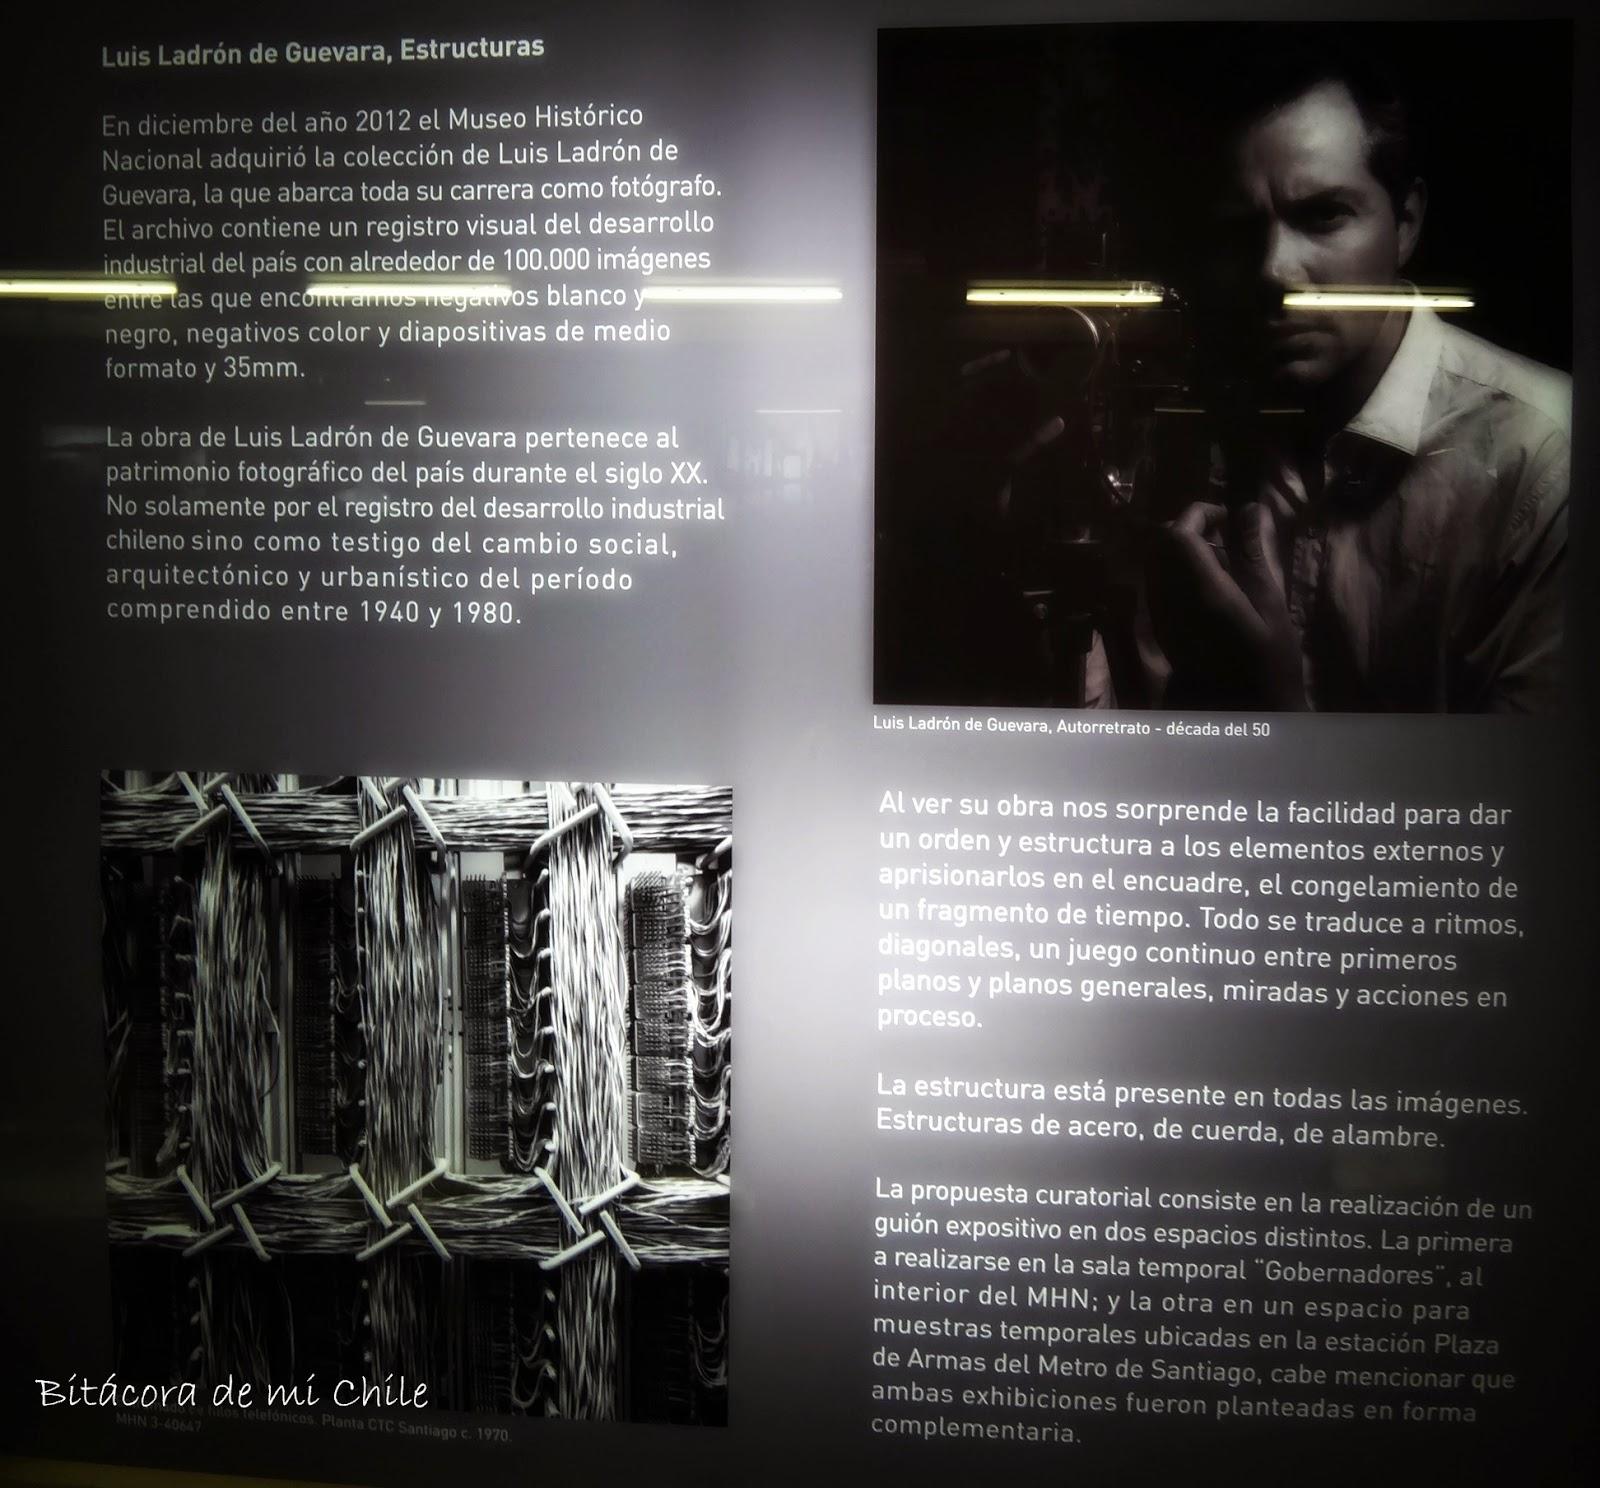 Bitacora de mi Chile: ESTRUCTURAS